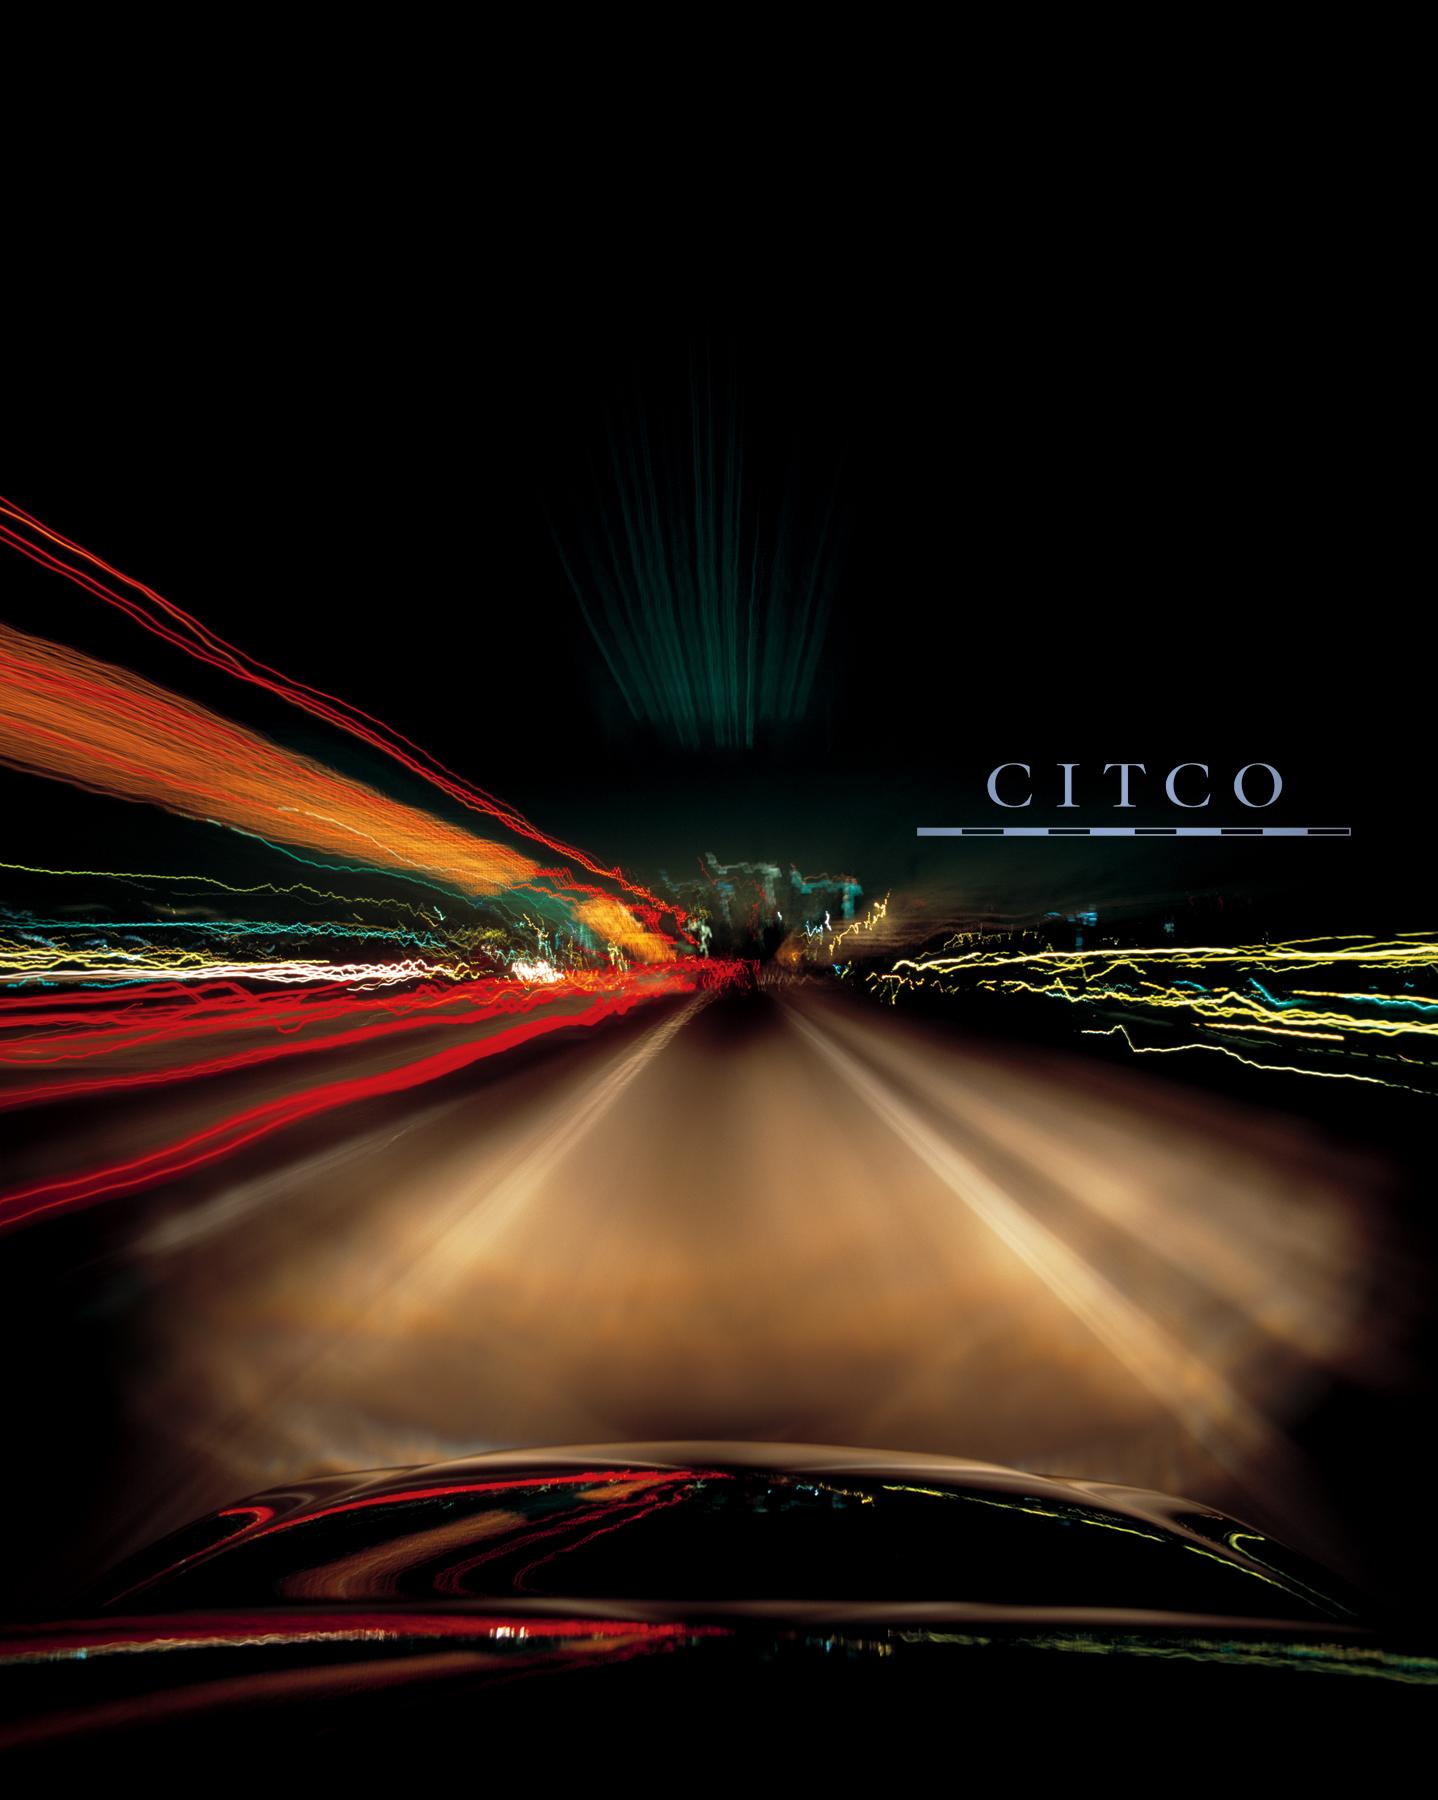 Citco BMW Folio Print.jpg